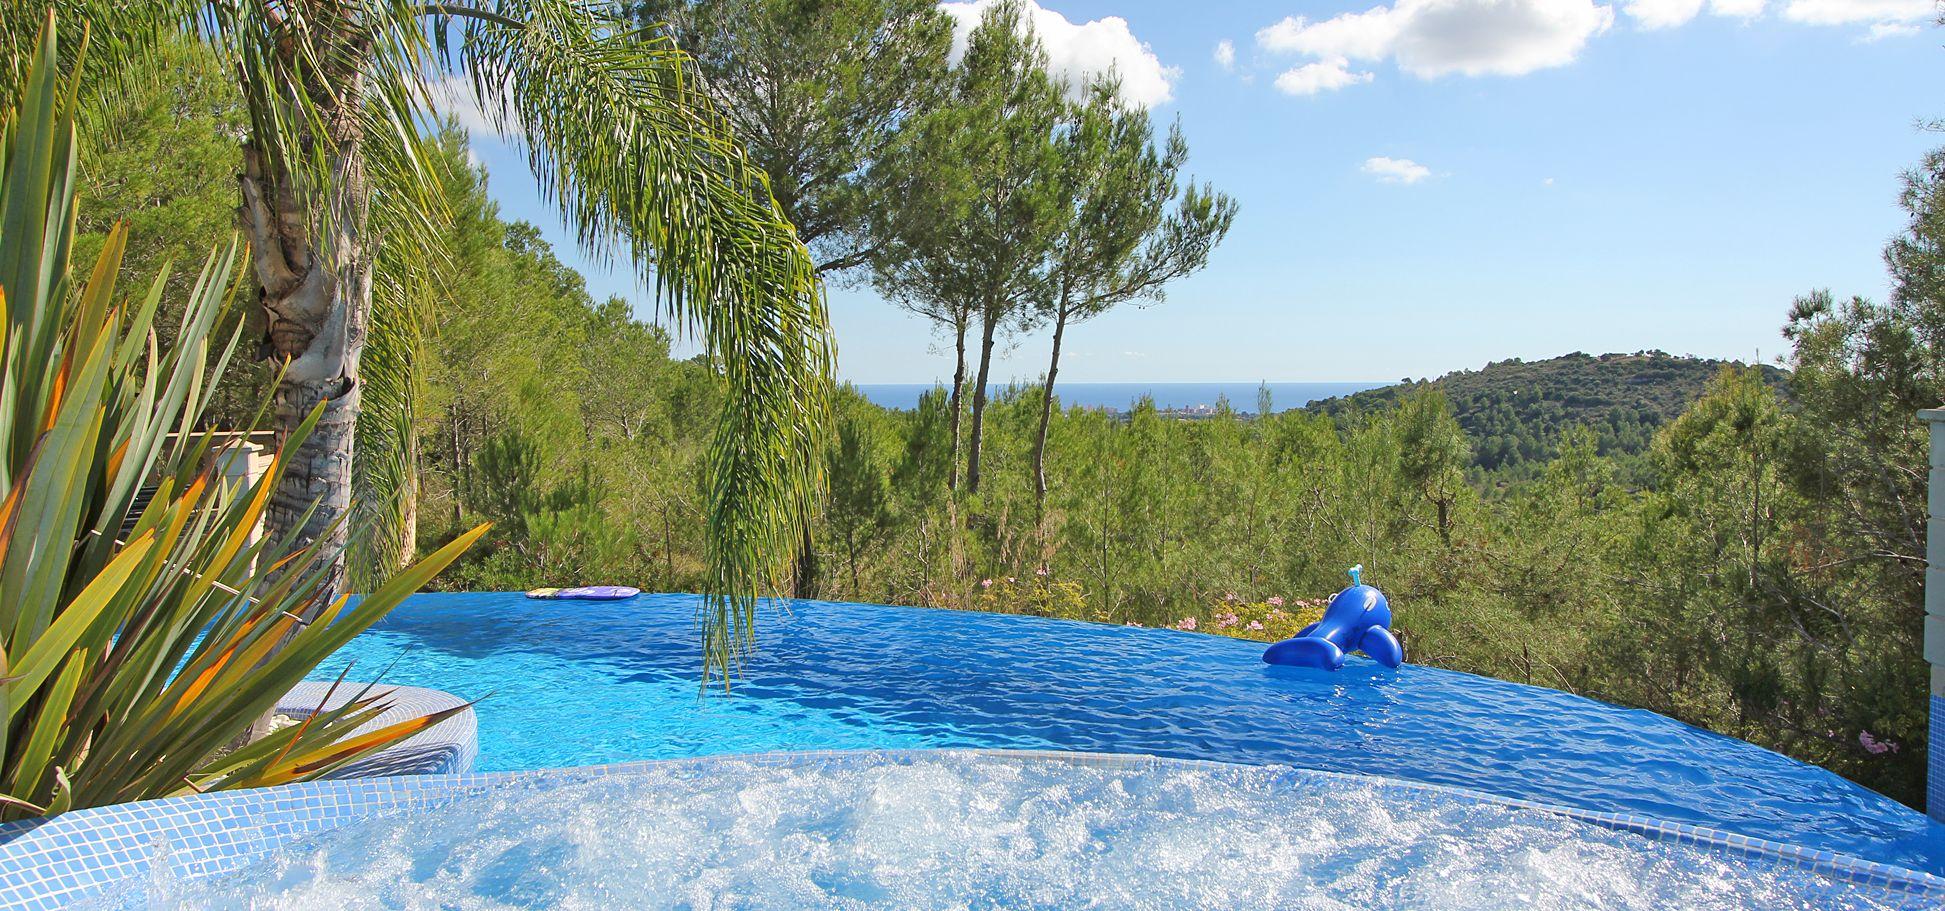 Villa Mallorca MA6651 Meerblick vom Whirlpool